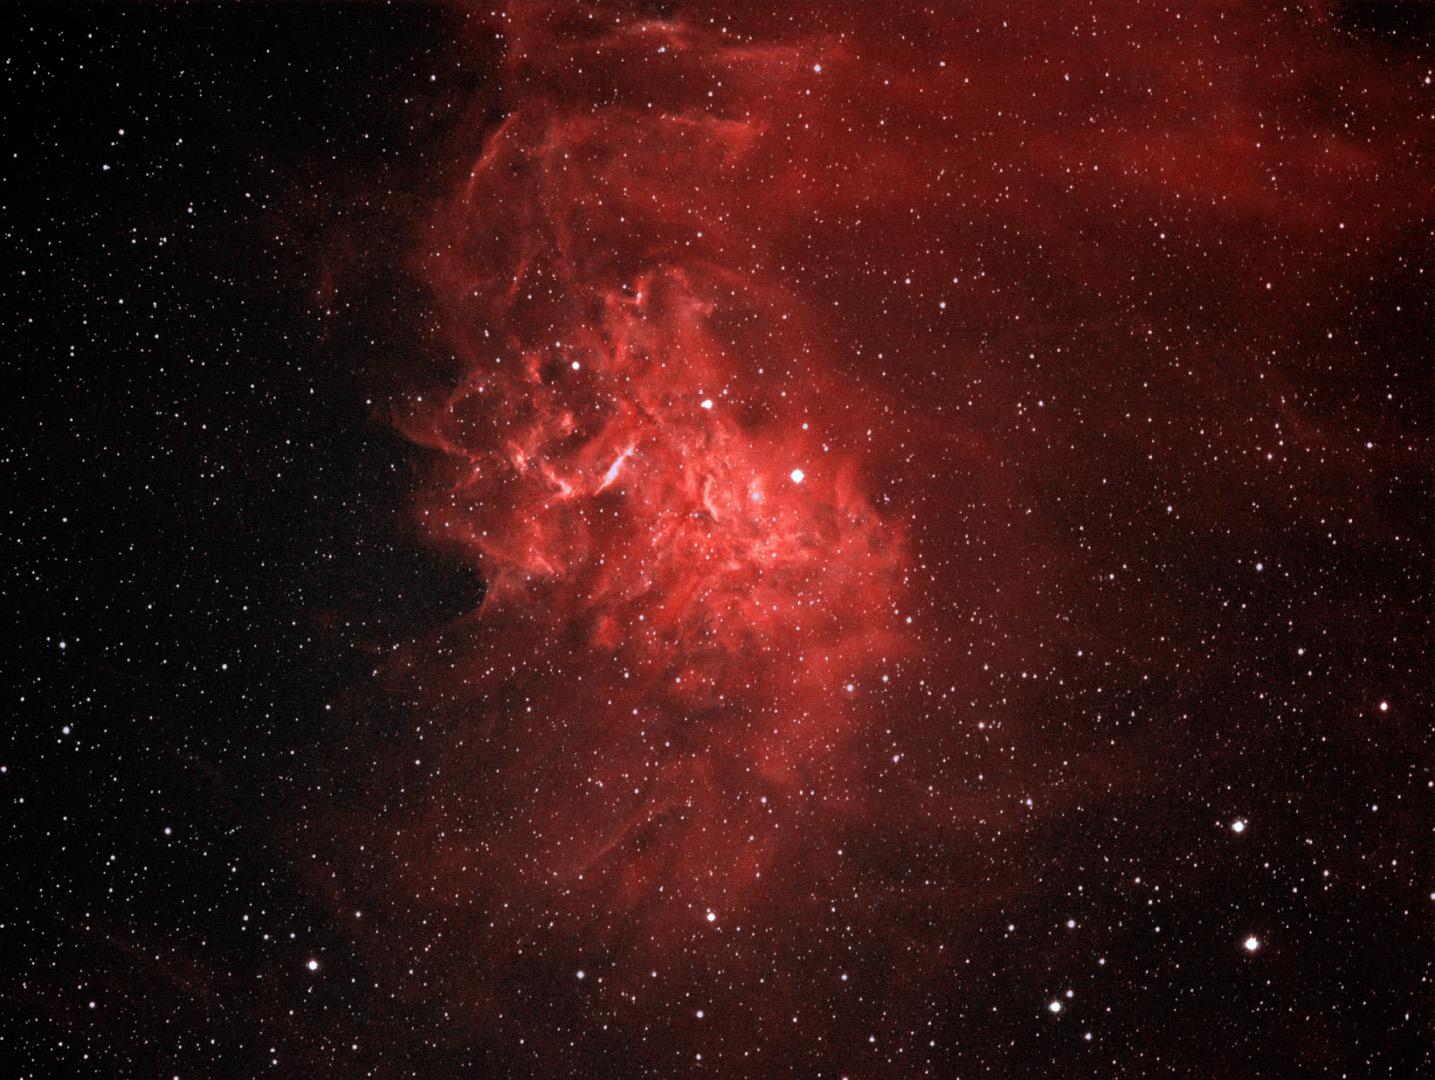 IC 405, Flaming Star Nebula in Auriga, large